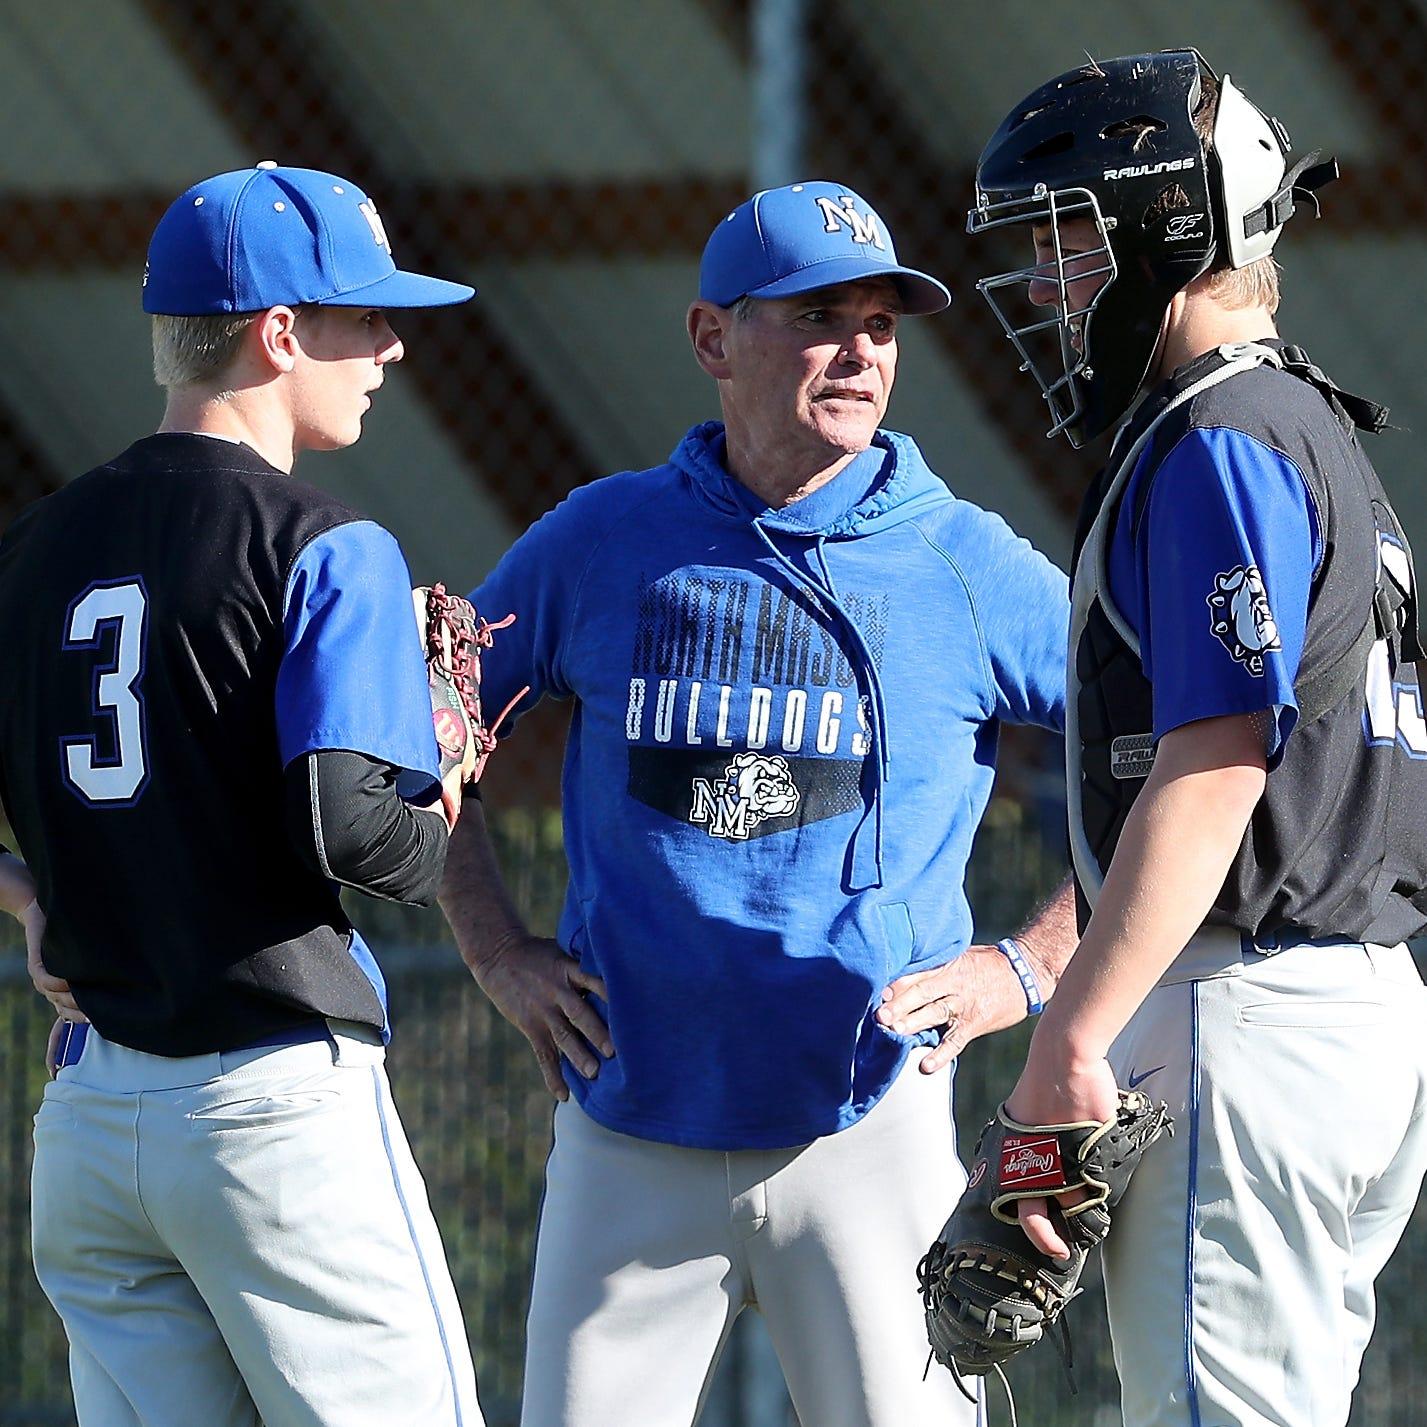 North Mason coach Geyer balancing baseball, cancer fight